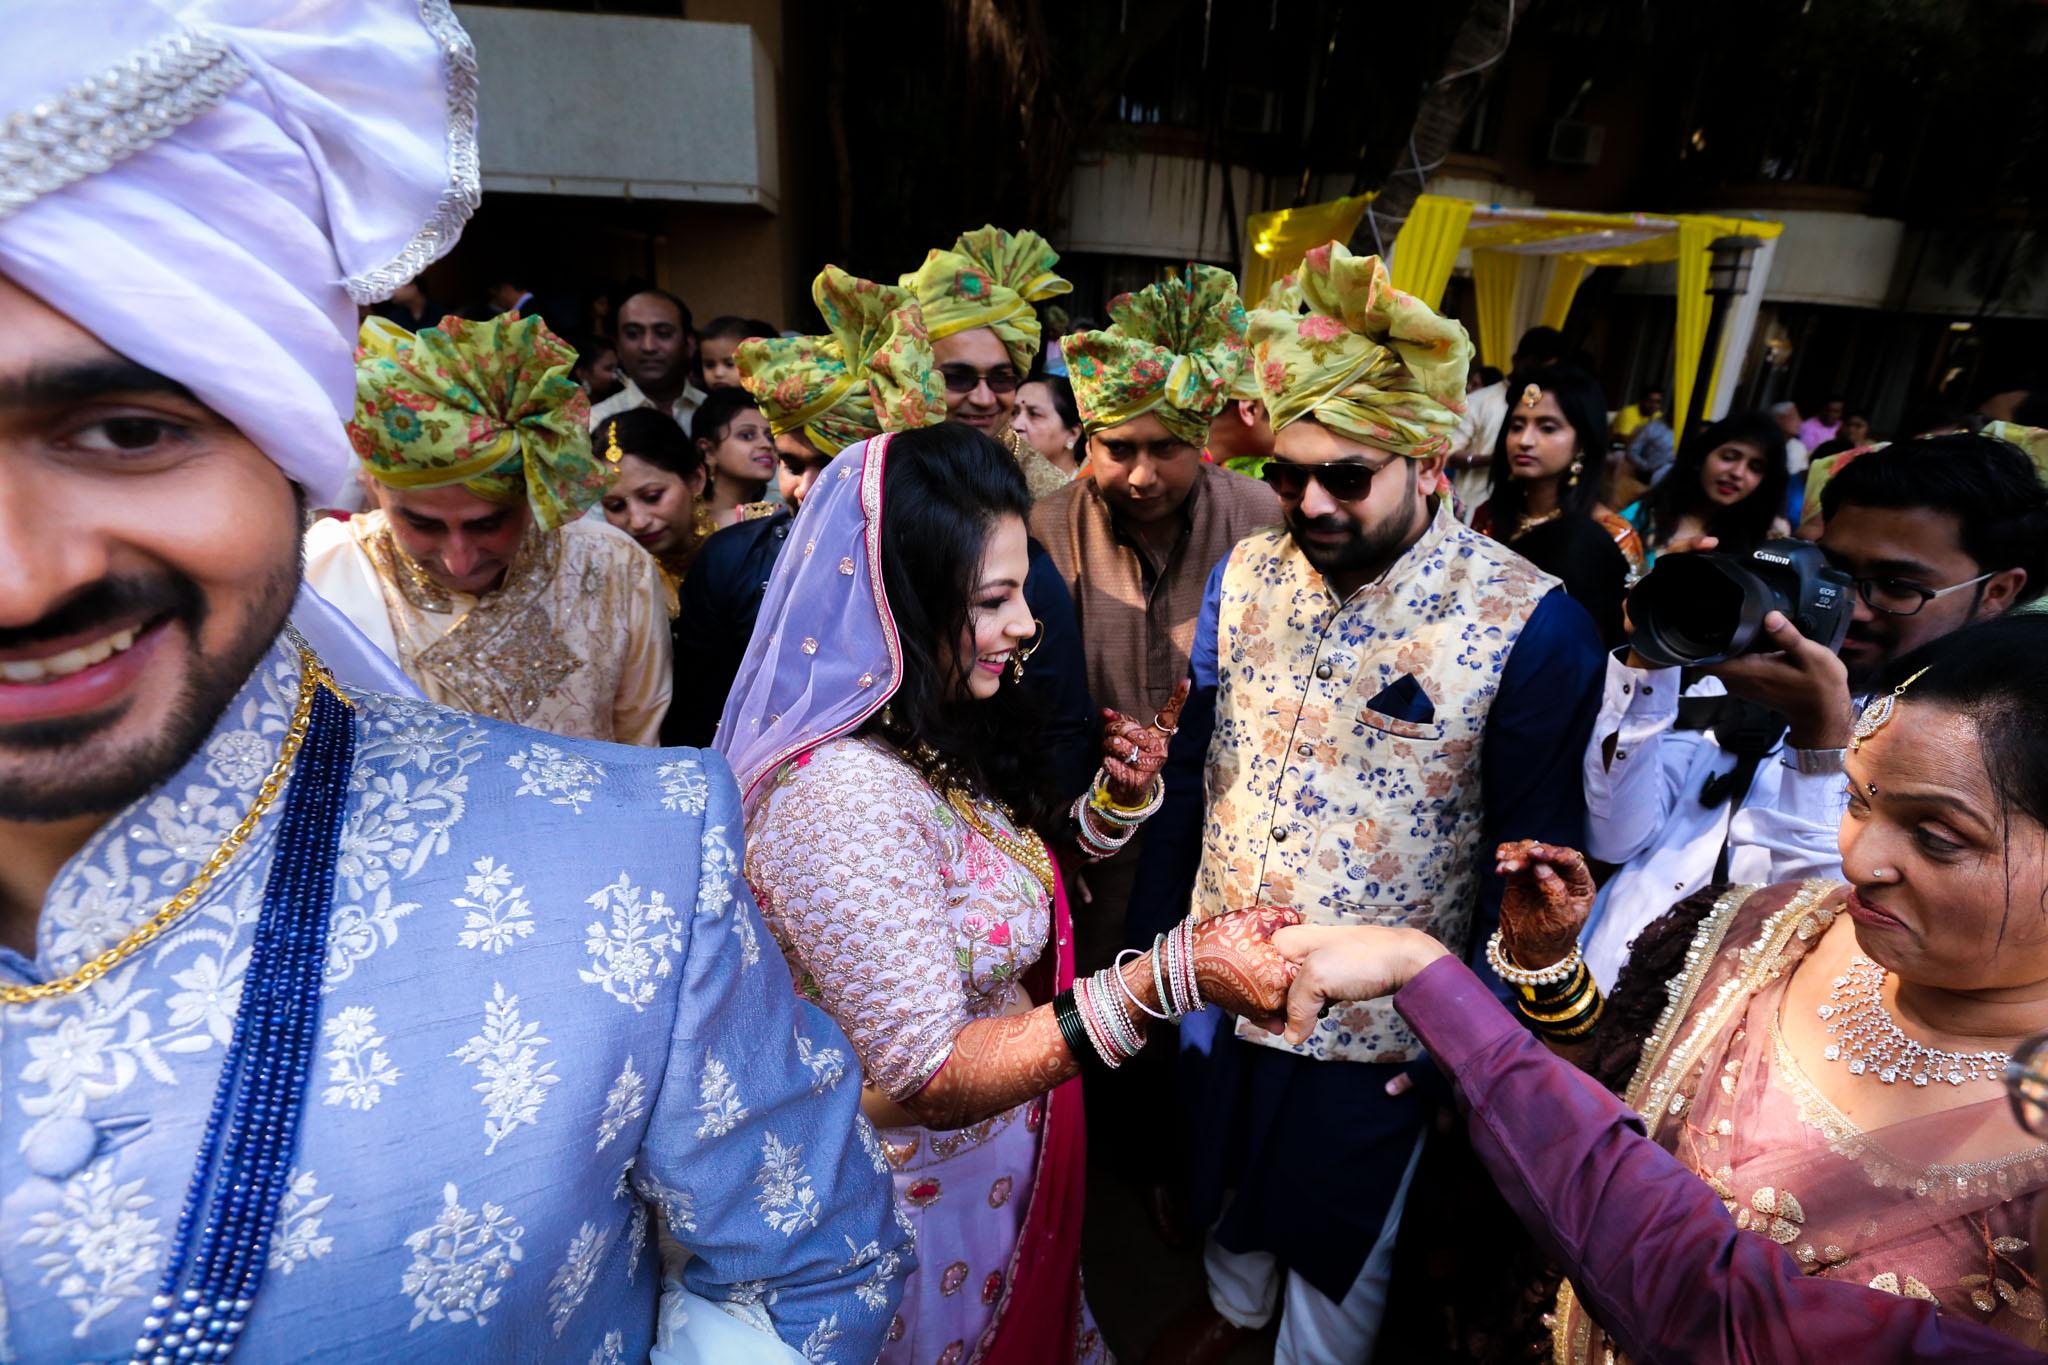 Mukti x Ojas Wedding Akshjay Sansare Photography Best wedding photographer in mumbai India Candid Cinematic Films videos-25.jpg